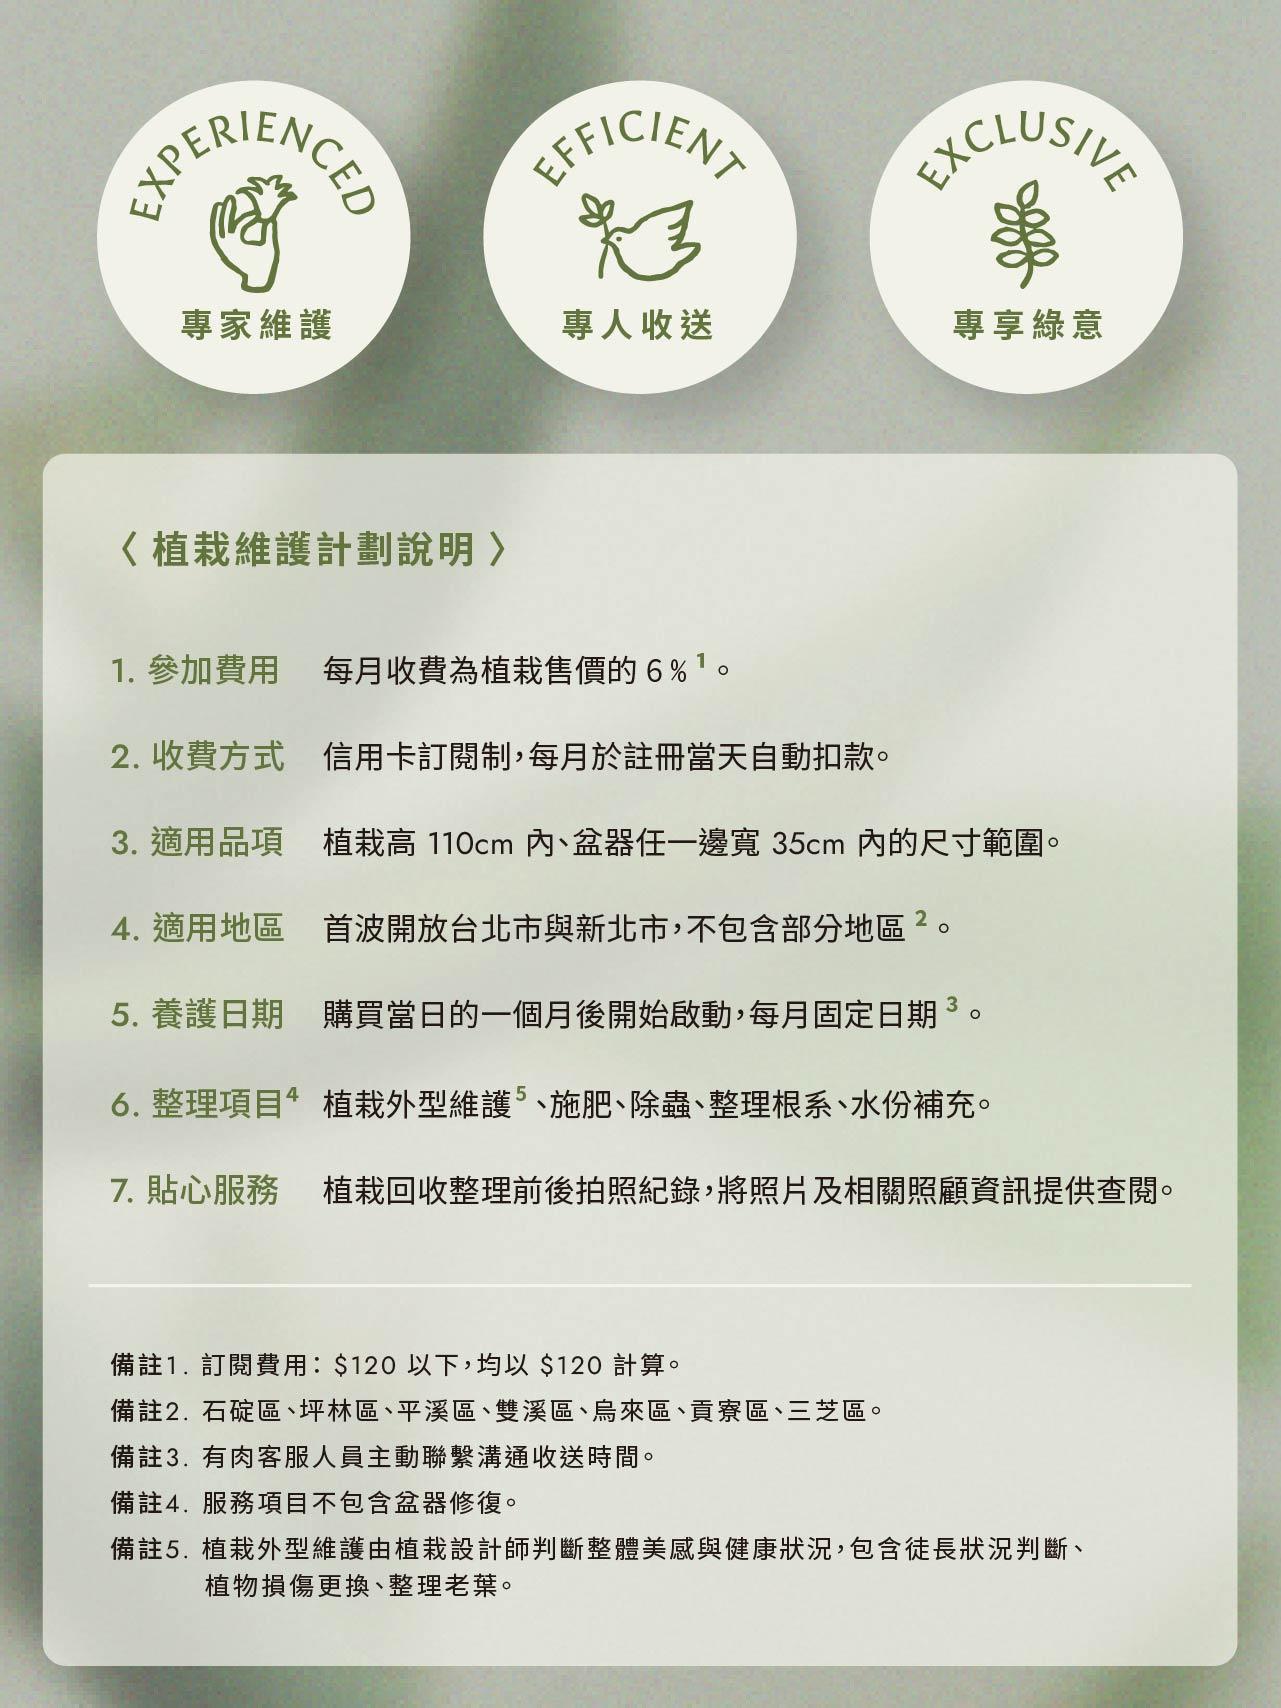 植栽維護計劃 Always Green 2 02